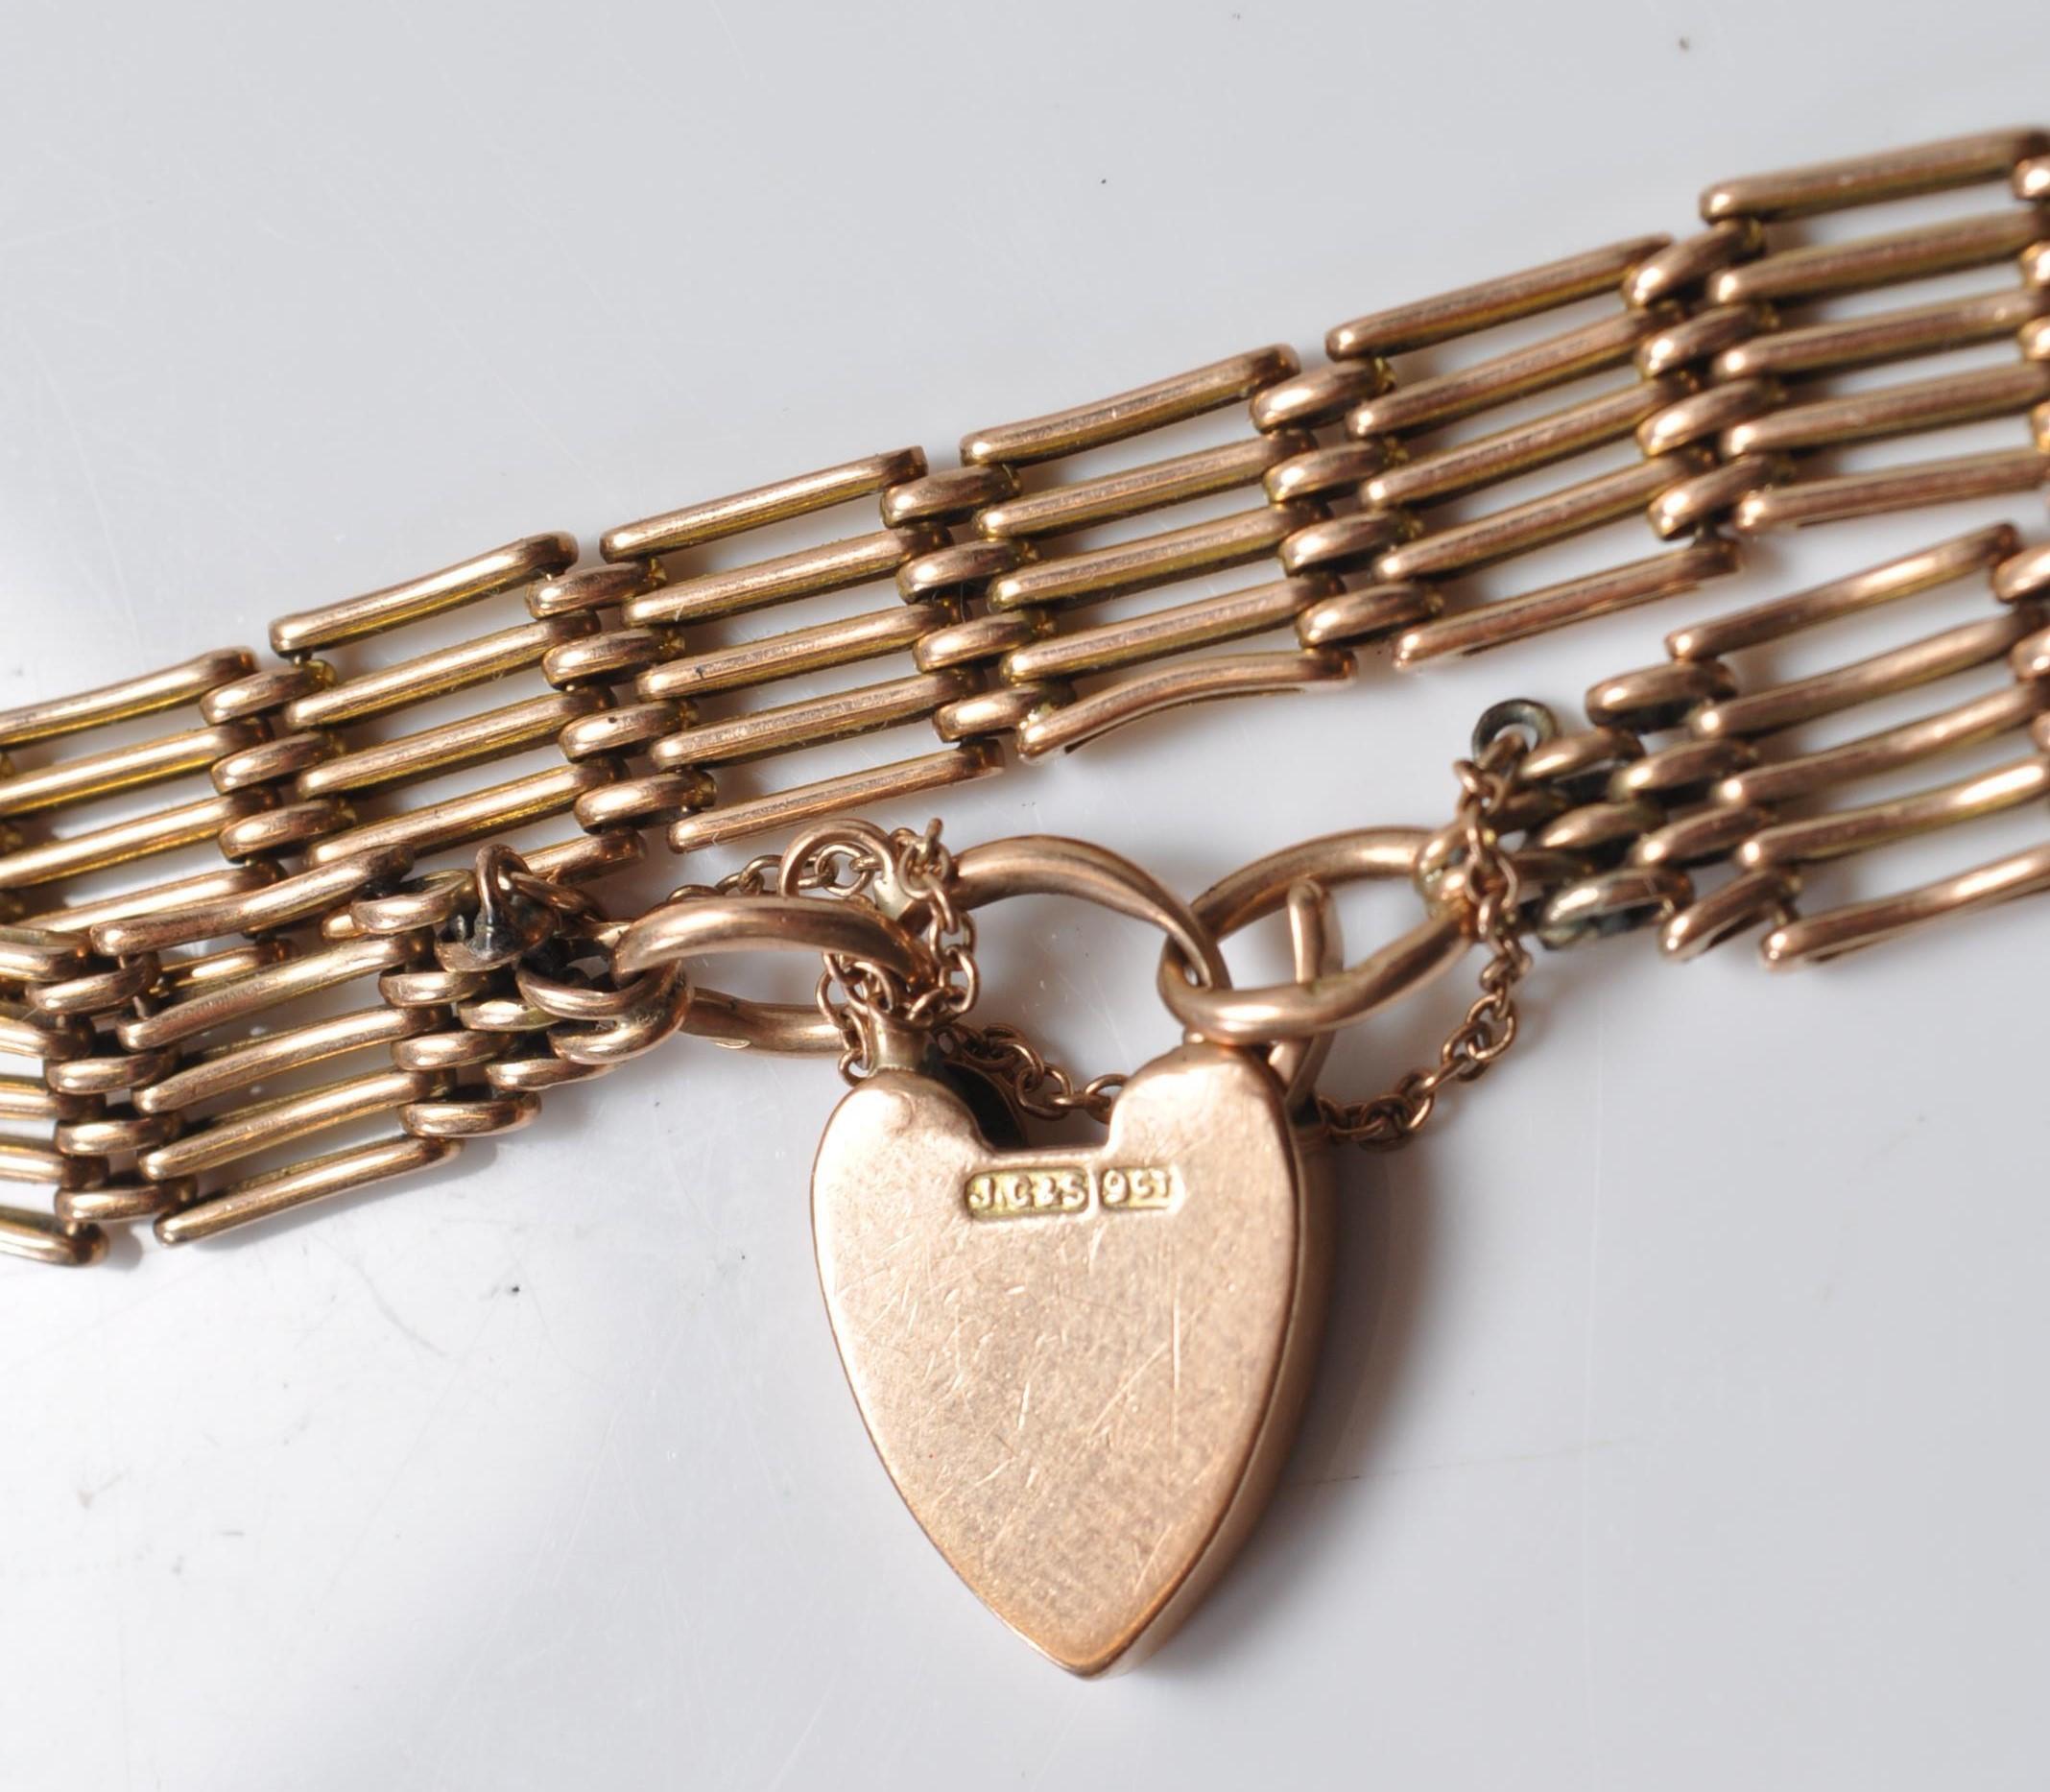 9CT GOLD GATELINK BRACELET - Image 2 of 5